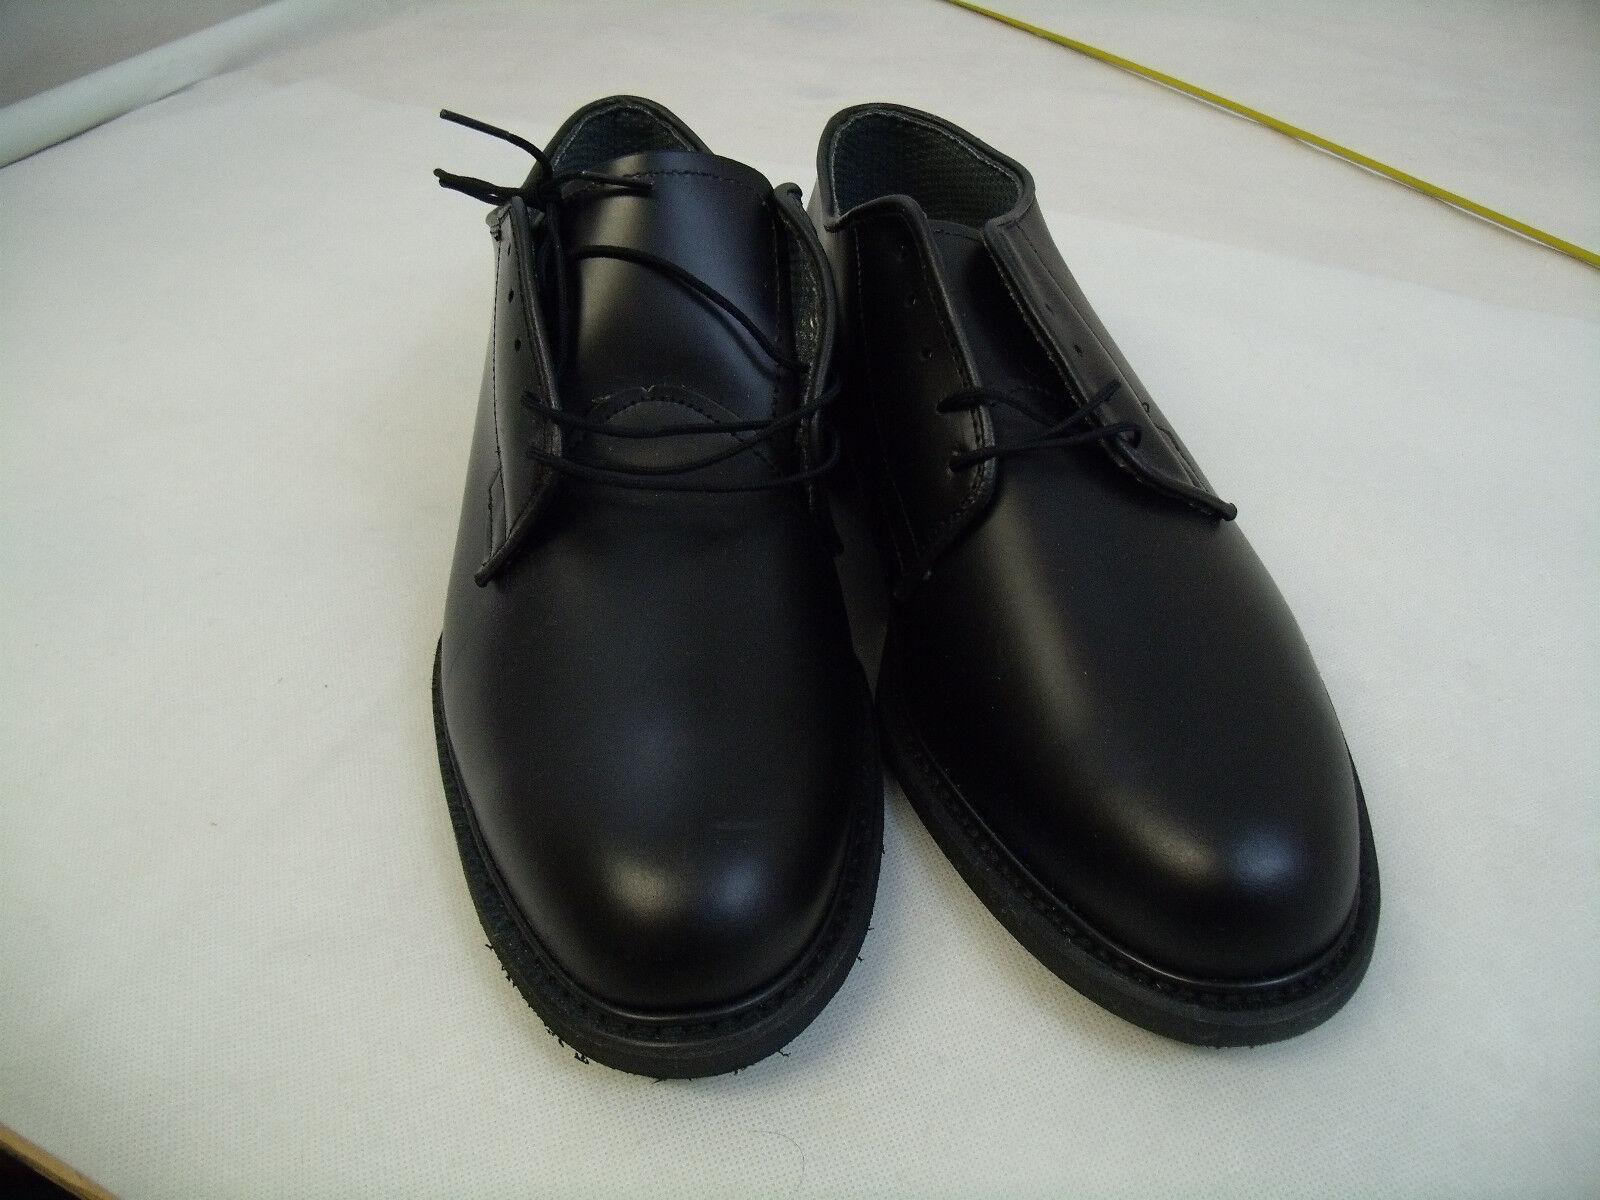 C446 NWOB BATES VIBRAM SOLES DRESS SHOES  US 12D